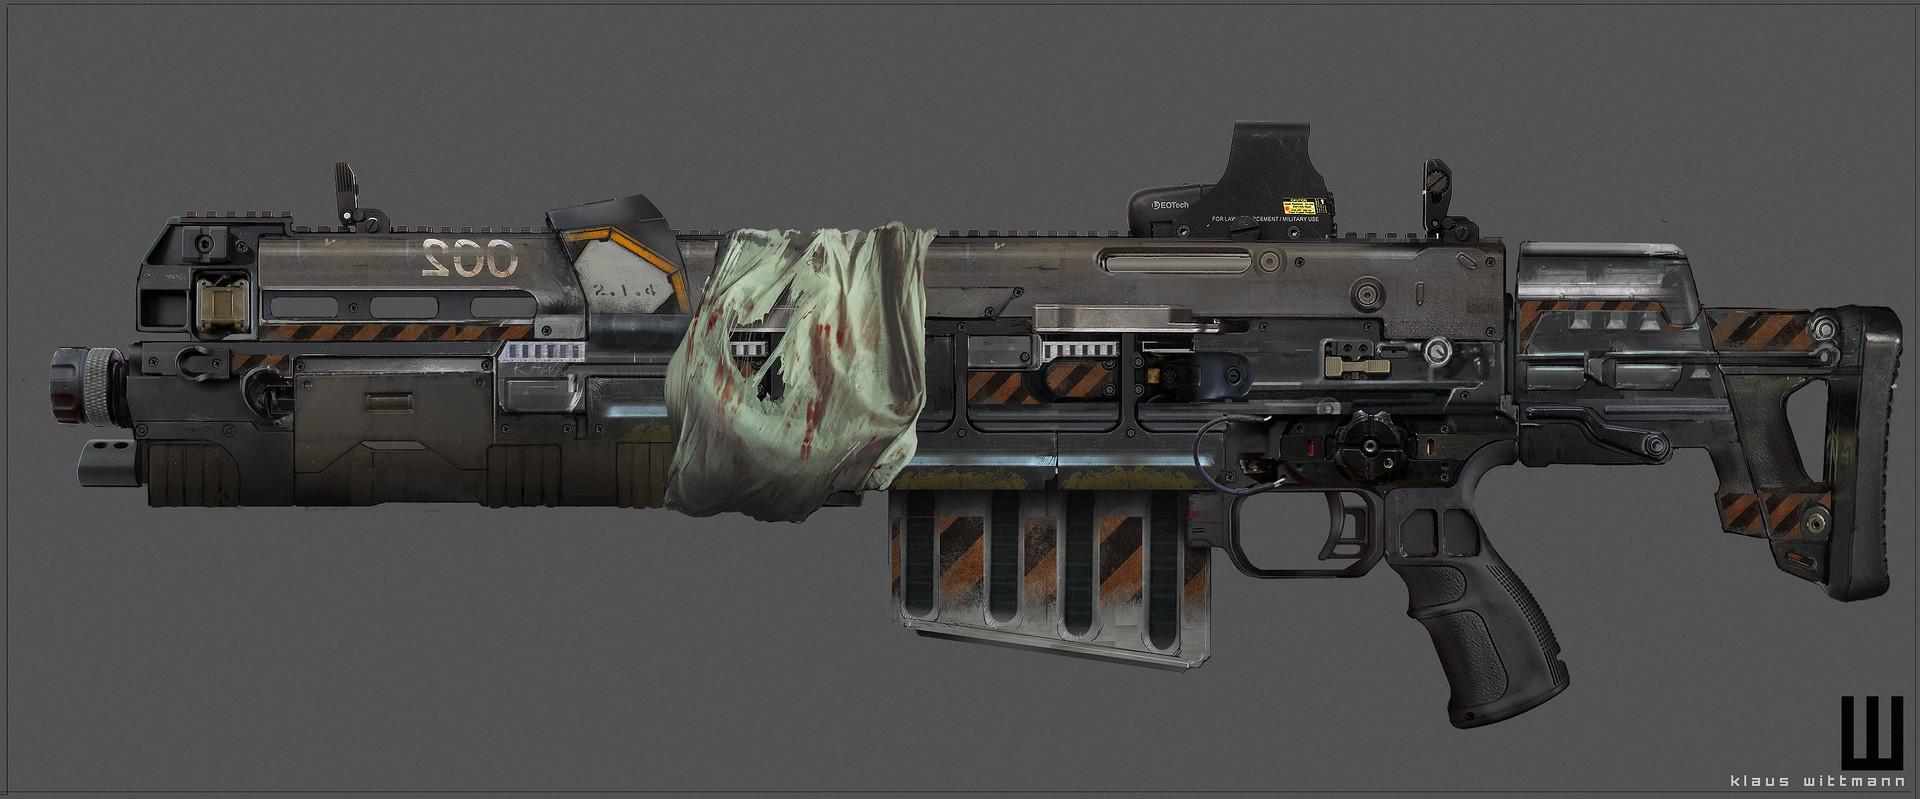 Klaus wittmann guns single